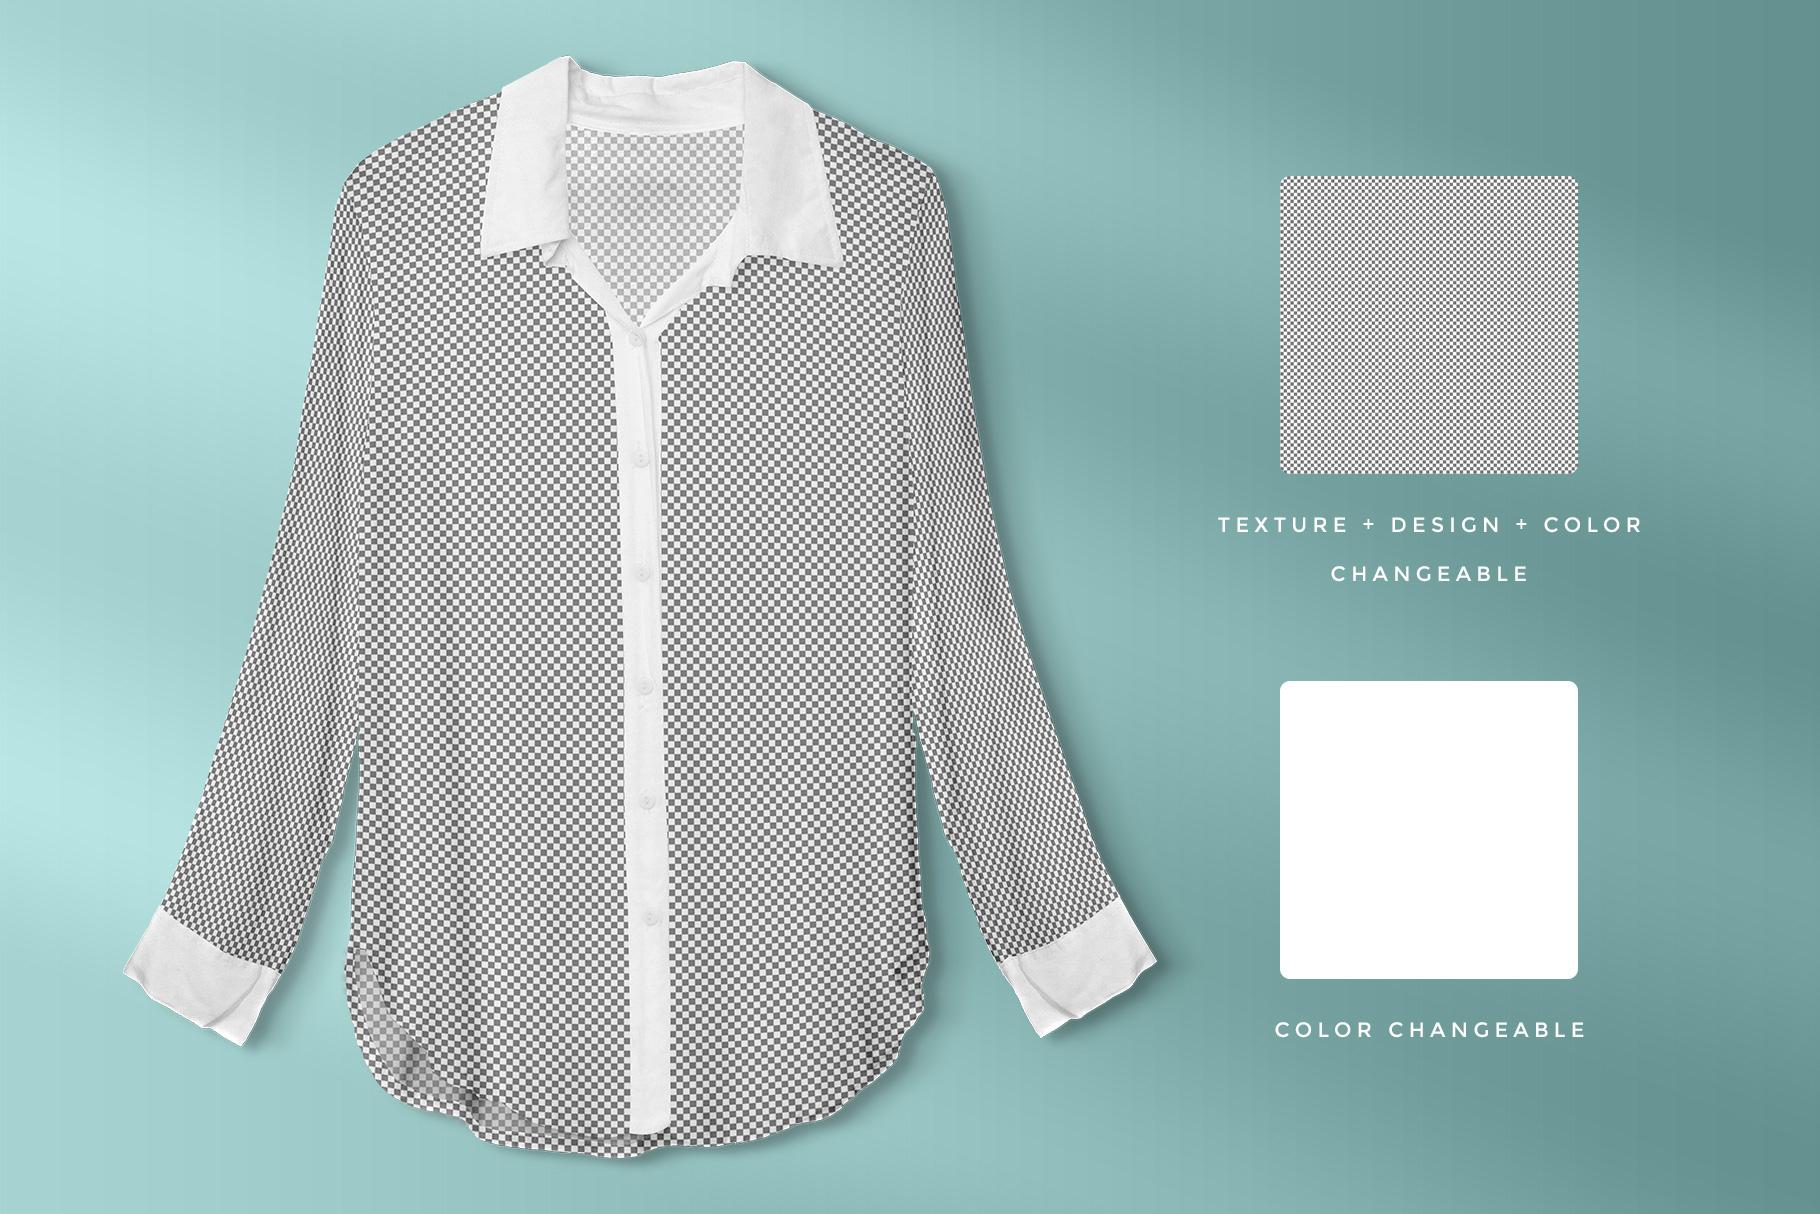 editability of the female long sleeve shirt mockup